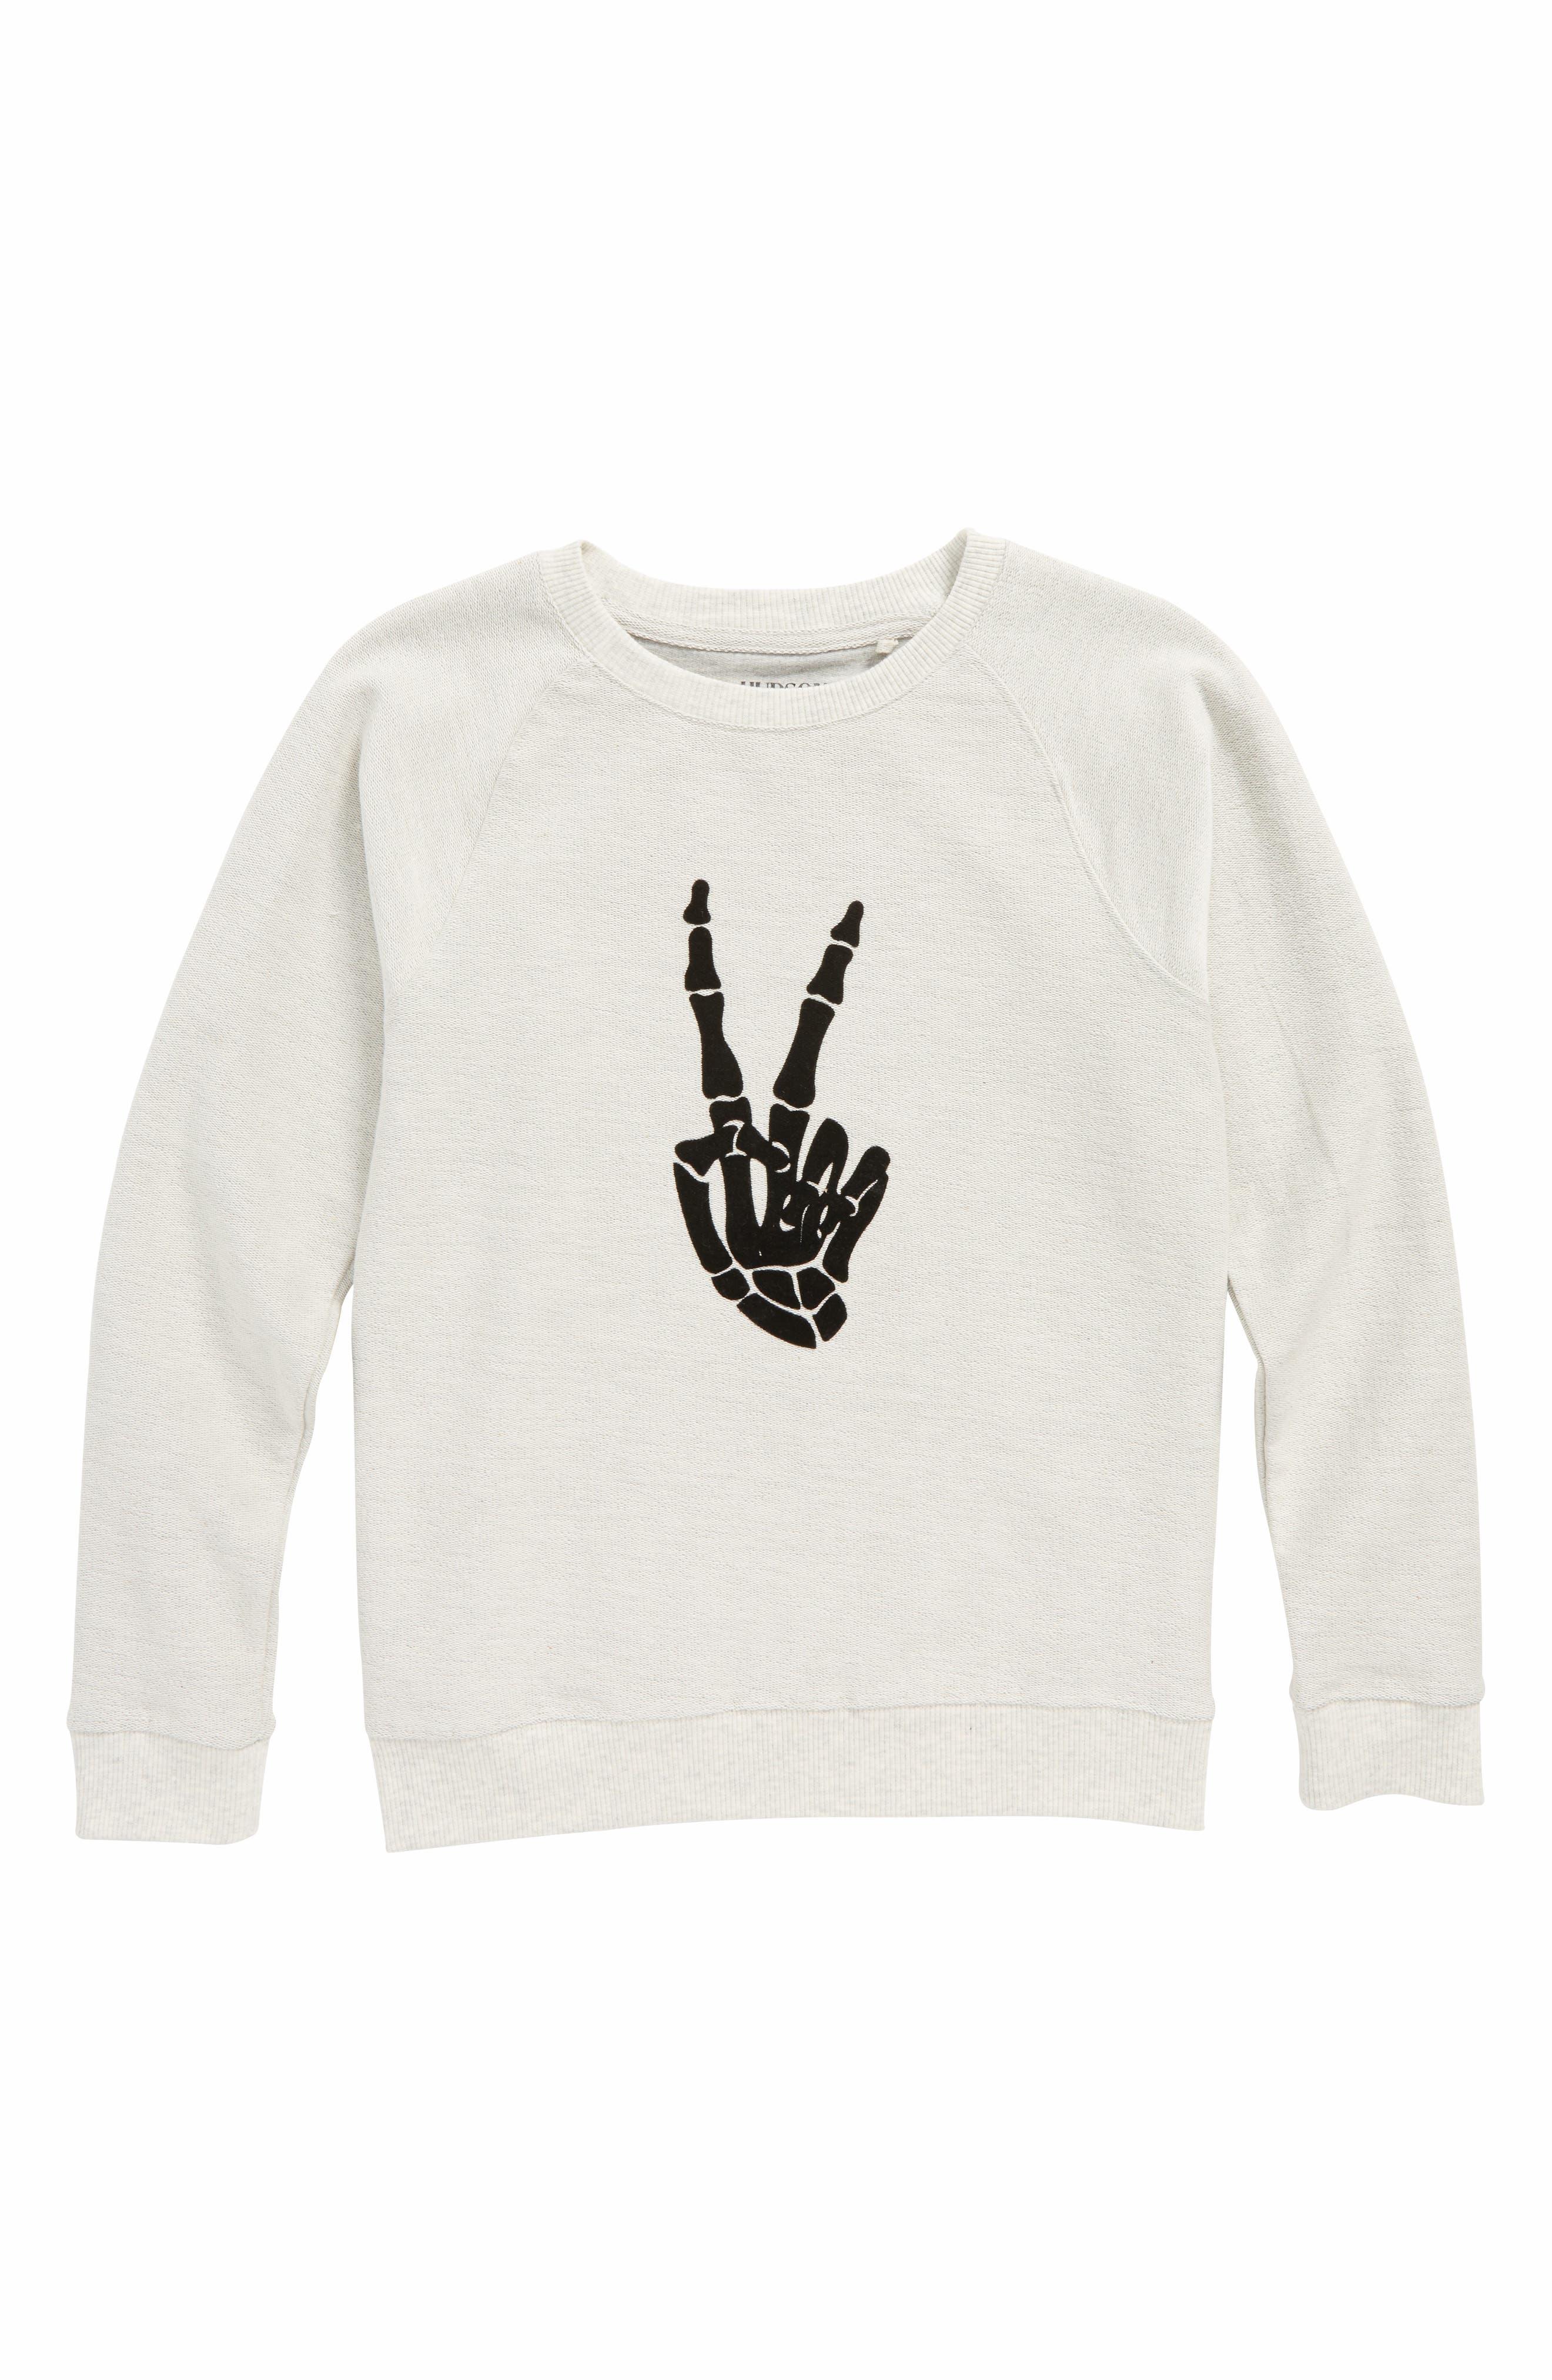 Hudson Kids Vibes Graphic Sweatshirt (Baby Boys)